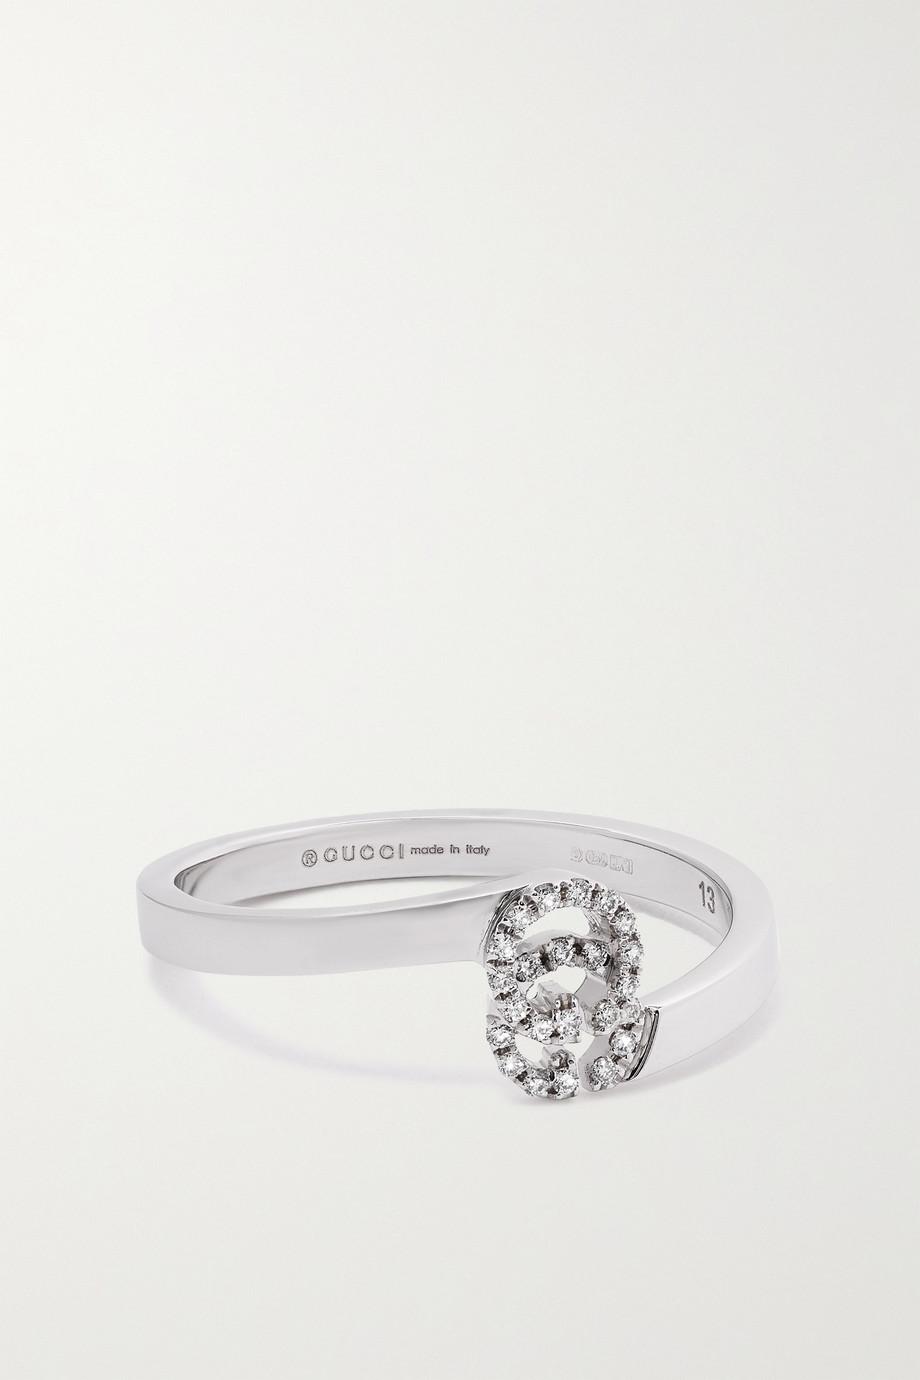 Gucci GG Running 18-karat white gold diamond ring